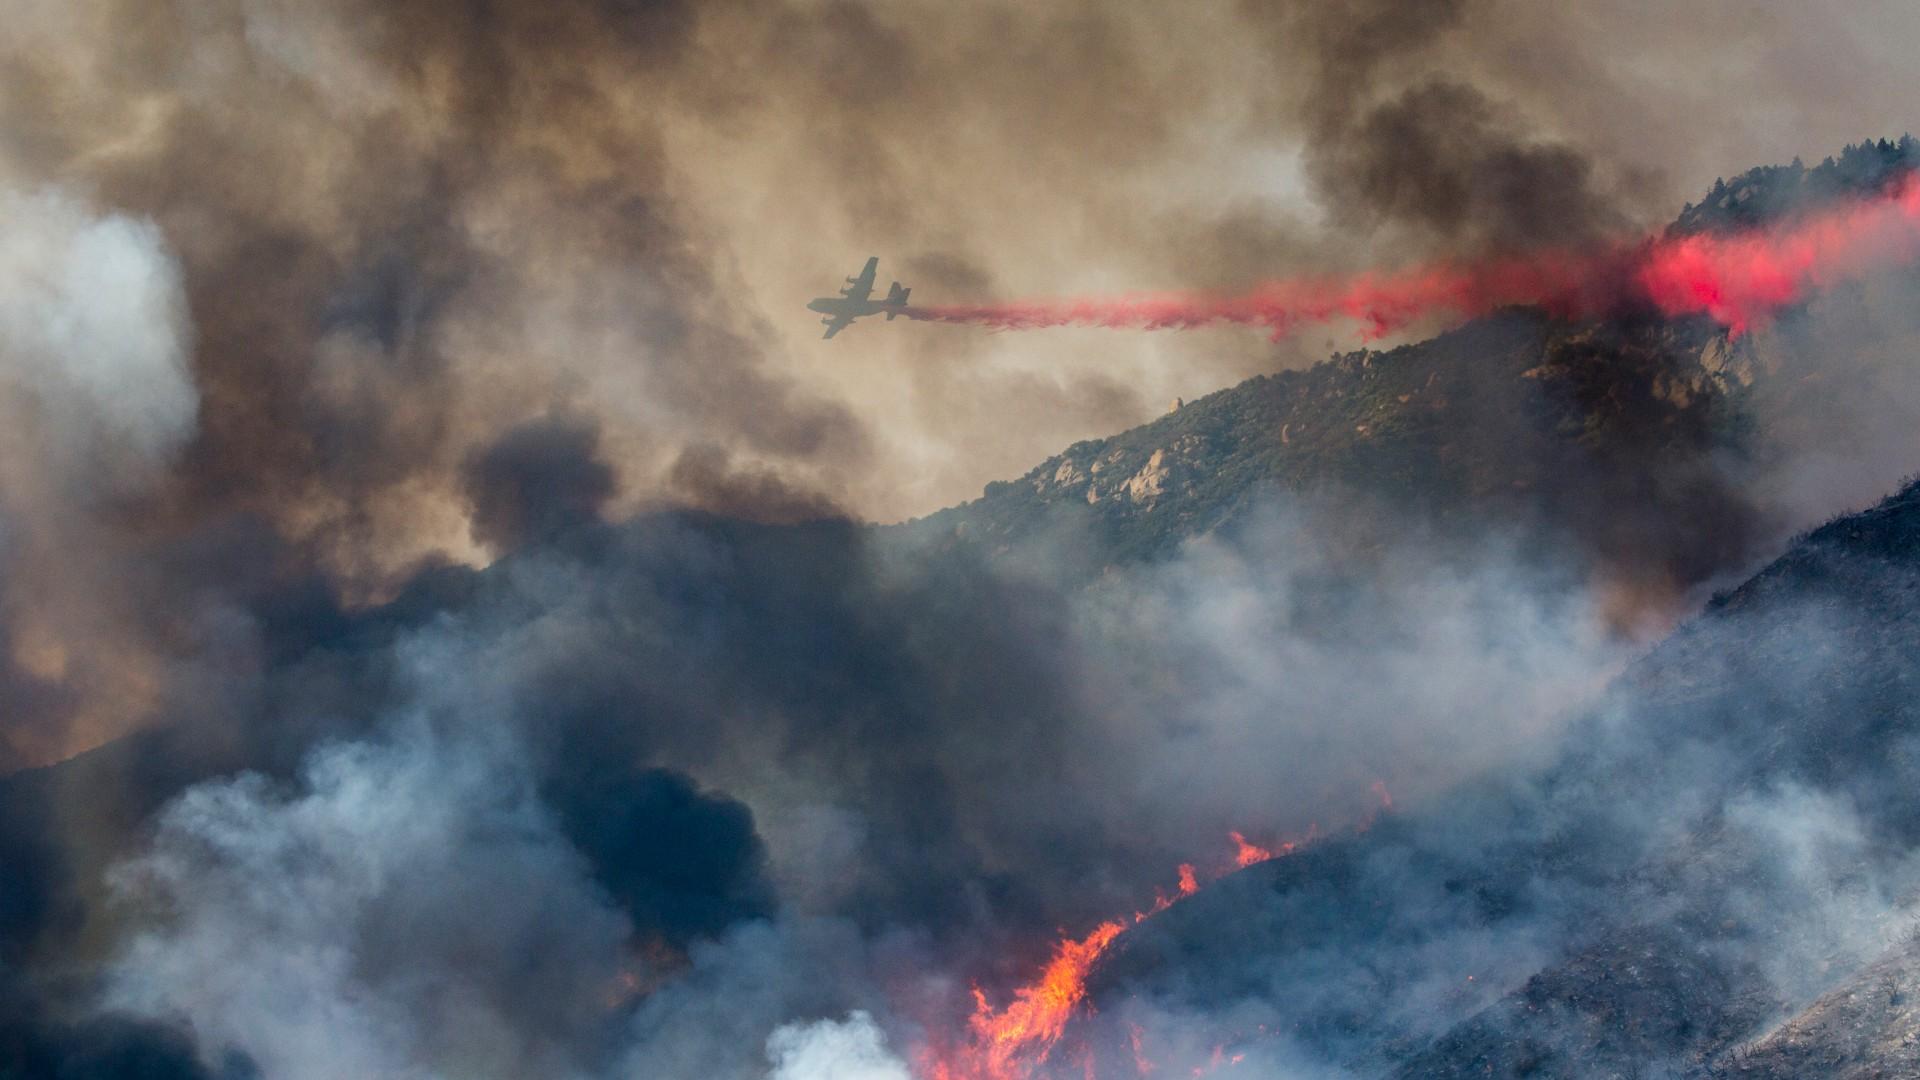 In this Saturday, Sept. 5, 2020 file photo, an air tanker drops fire retardant on a hillside wildfire in Yucaipa, Calif. (AP Photo/Ringo H.W. Chiu)